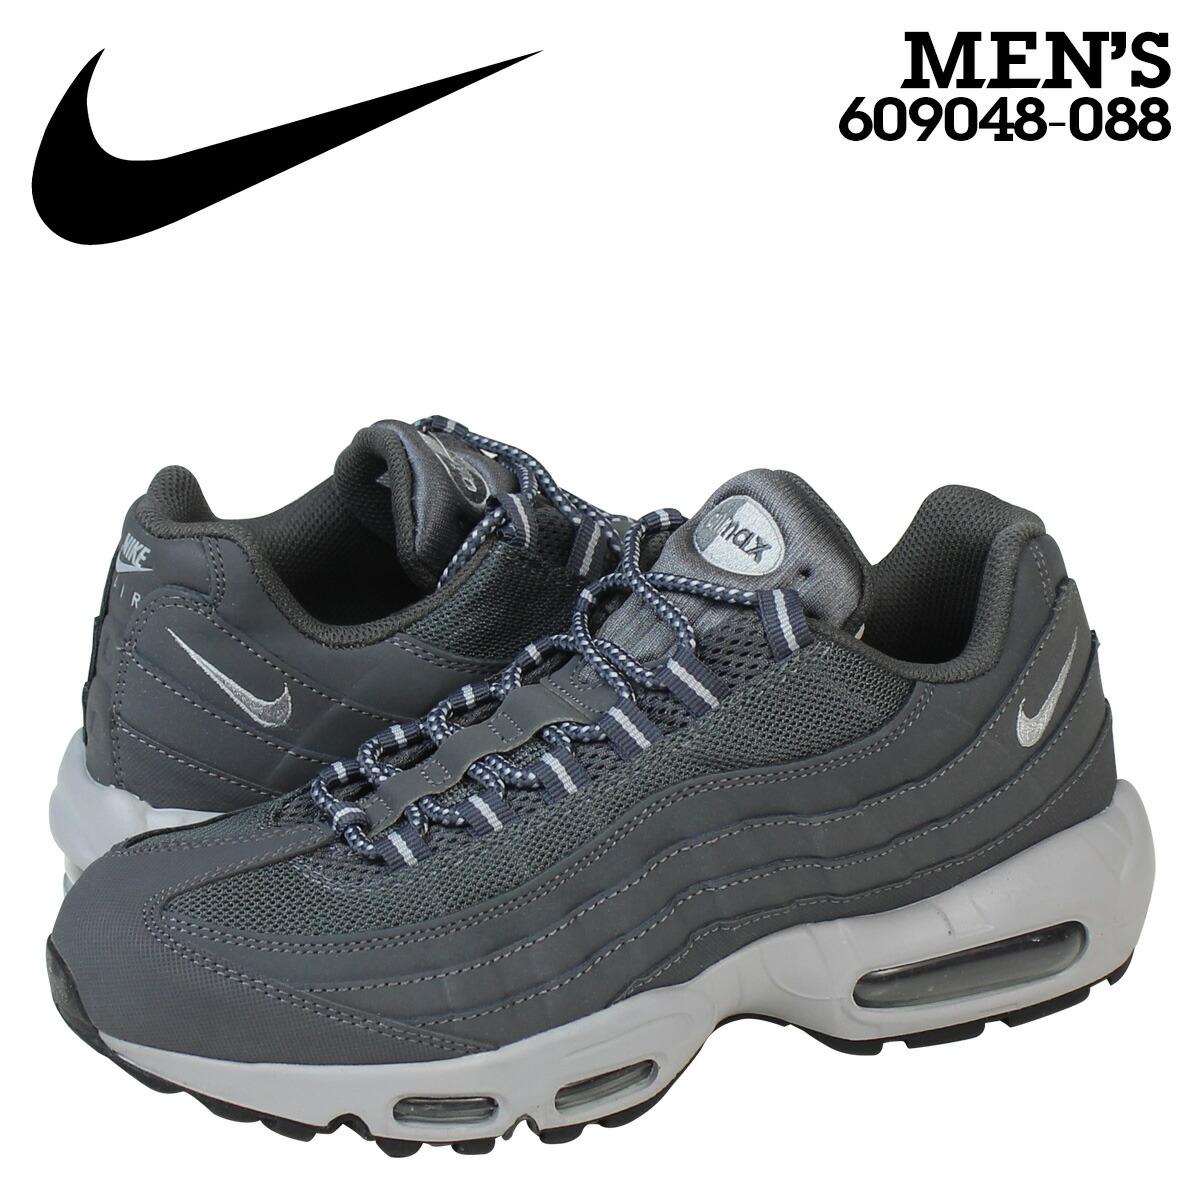 0e17162a742 nike air max 95 sneakers